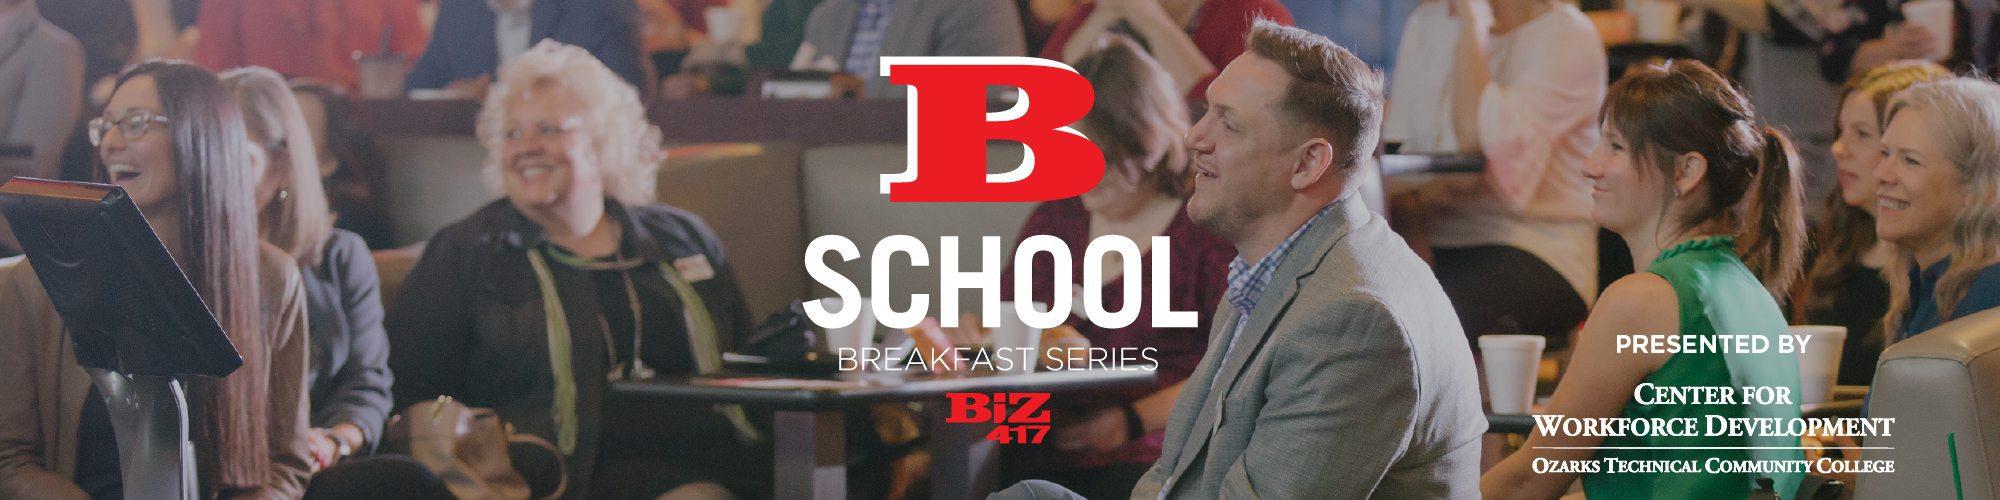 Biz 417's B-School Breakfast Series